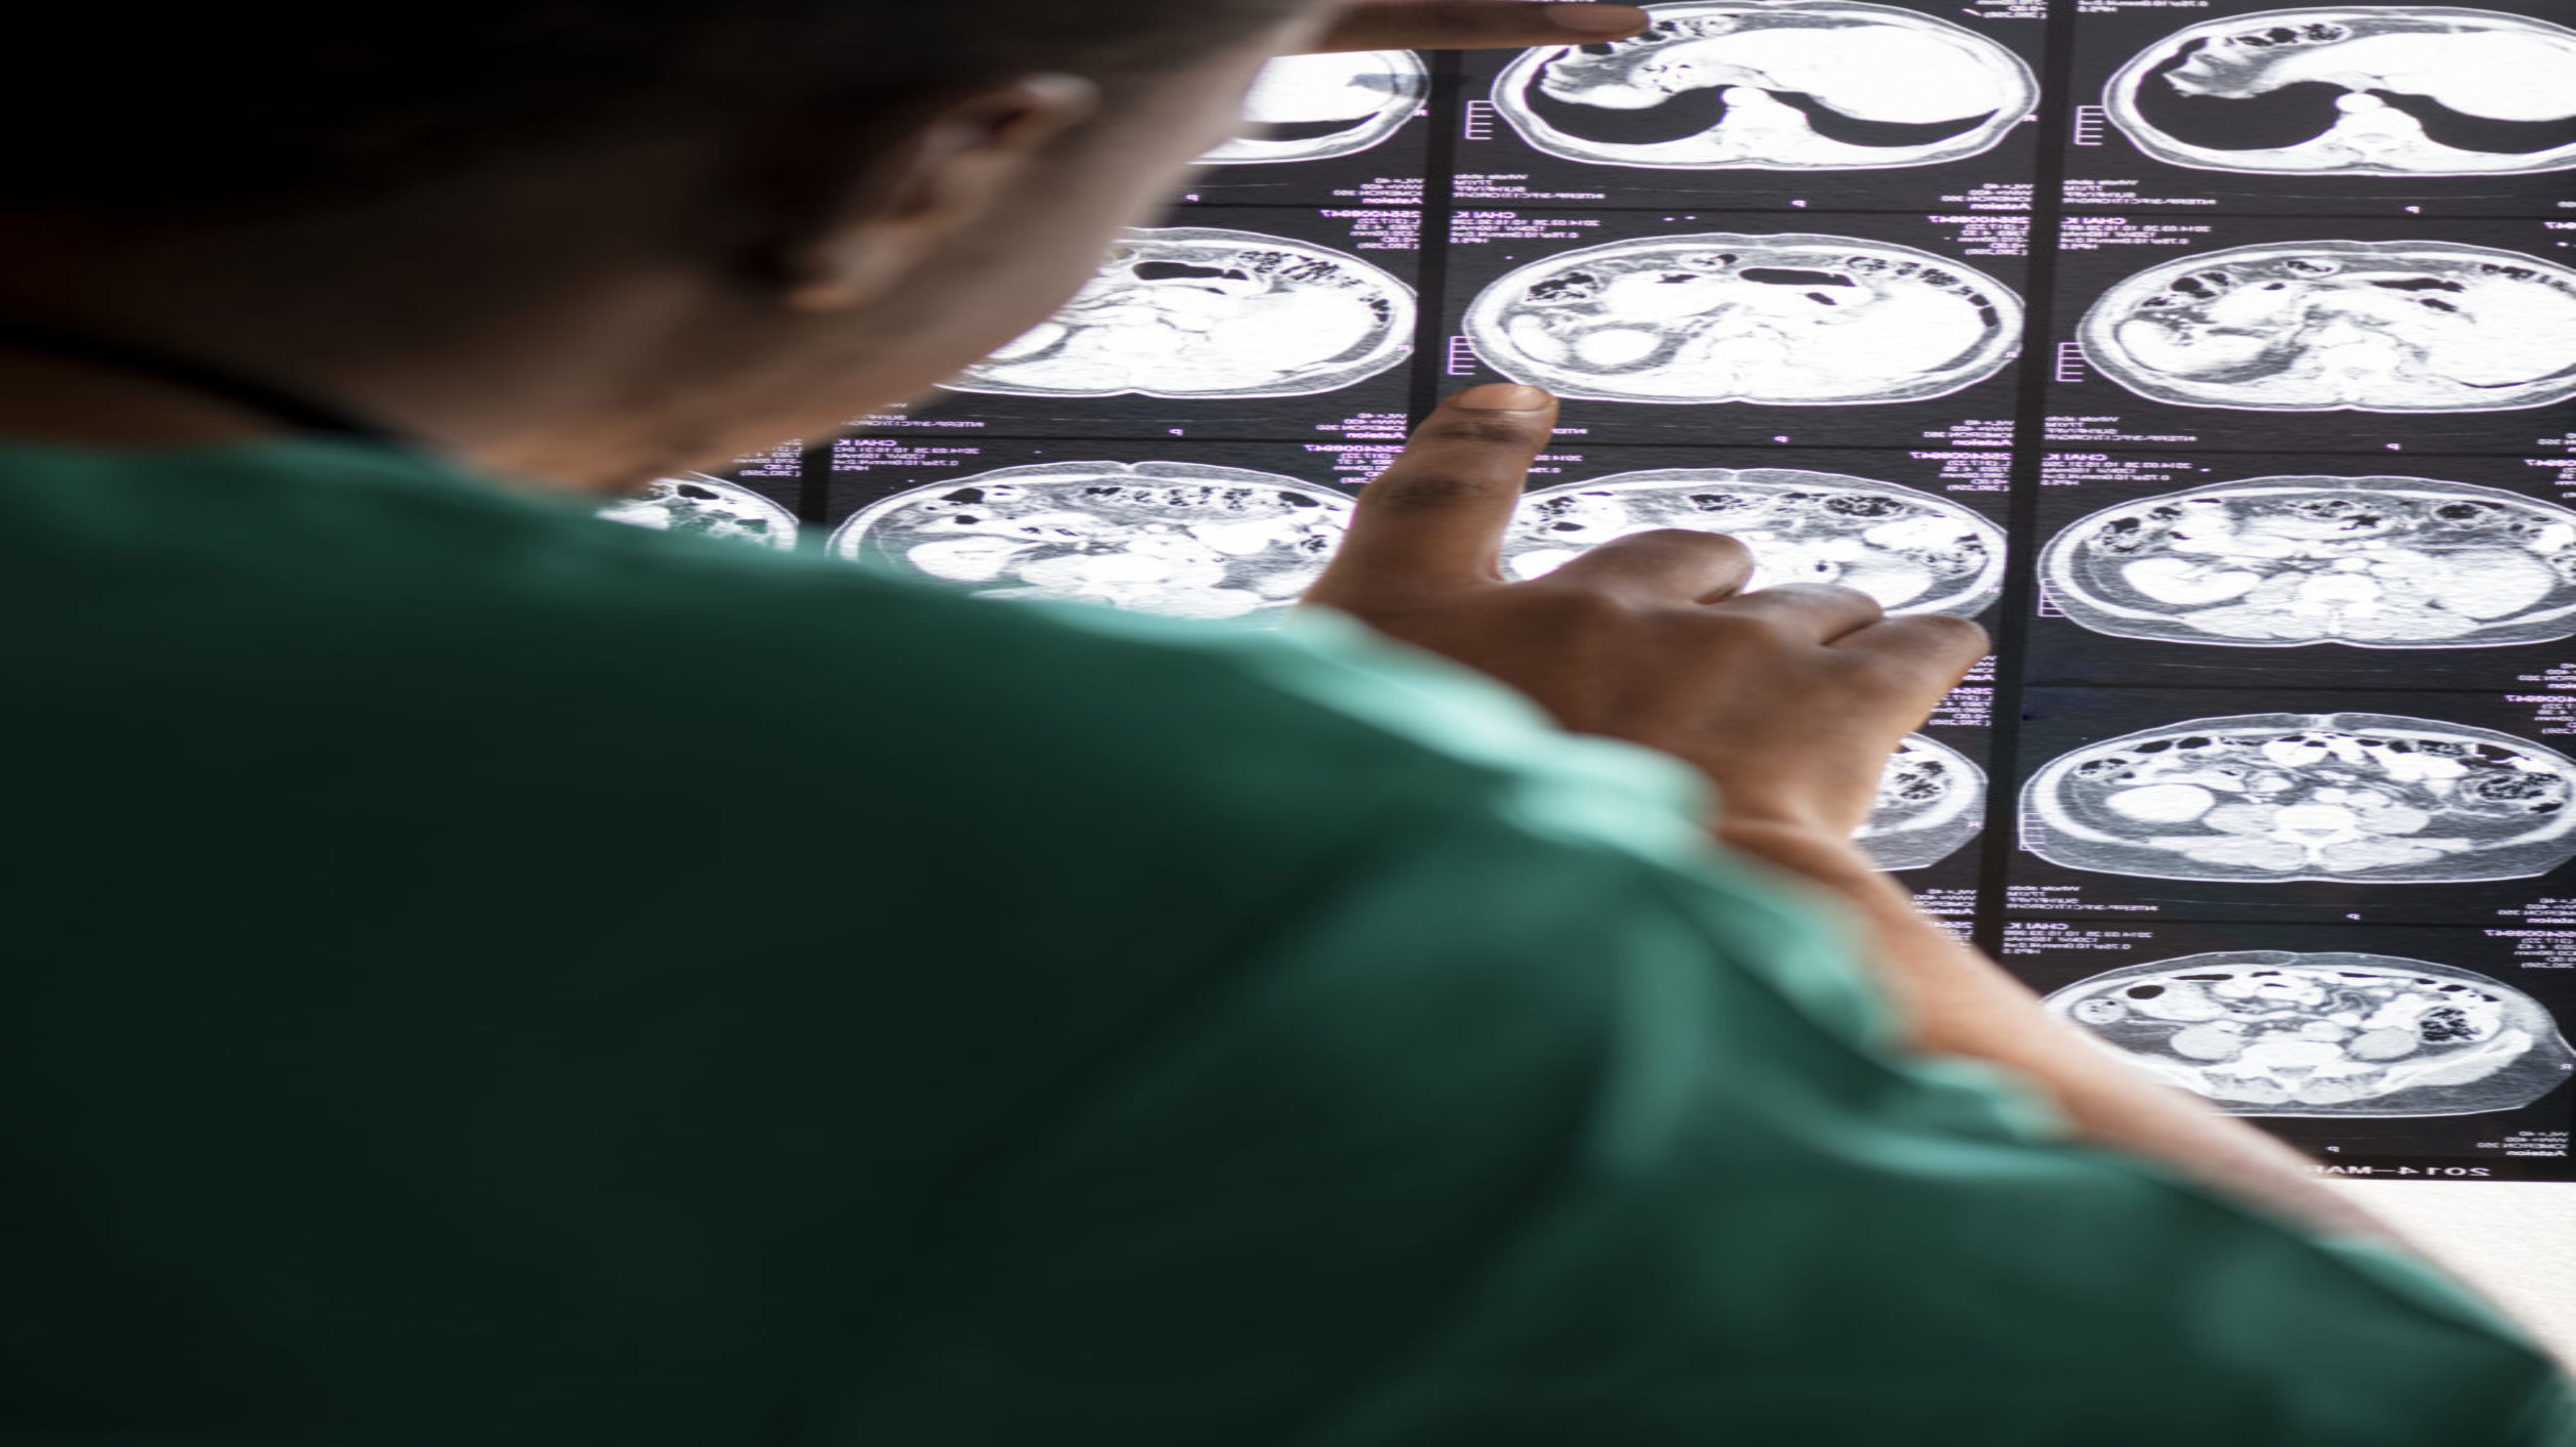 cropped-doctor-reading-brain-mri-x-ray-result-PZJYCXB-e1564698475951.jpg